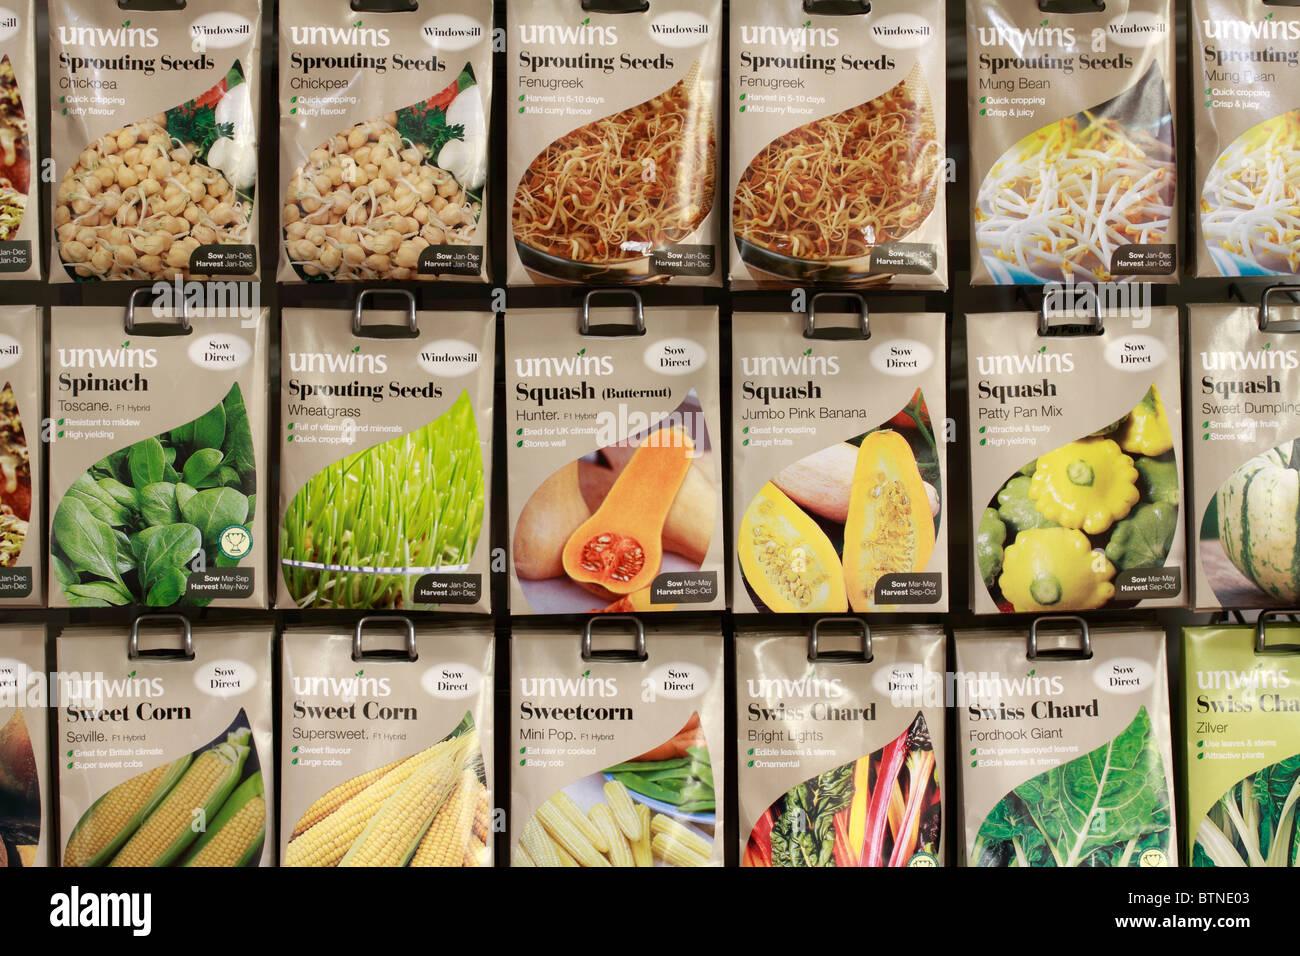 Vegetable Seed Packets. Chickpea, Fenugreek, Mung Bean, Spinach, Butternut  Squash, Patty Pan Squash, Sweet Dumpling Squash, Sweet Corn, Swiss Chard